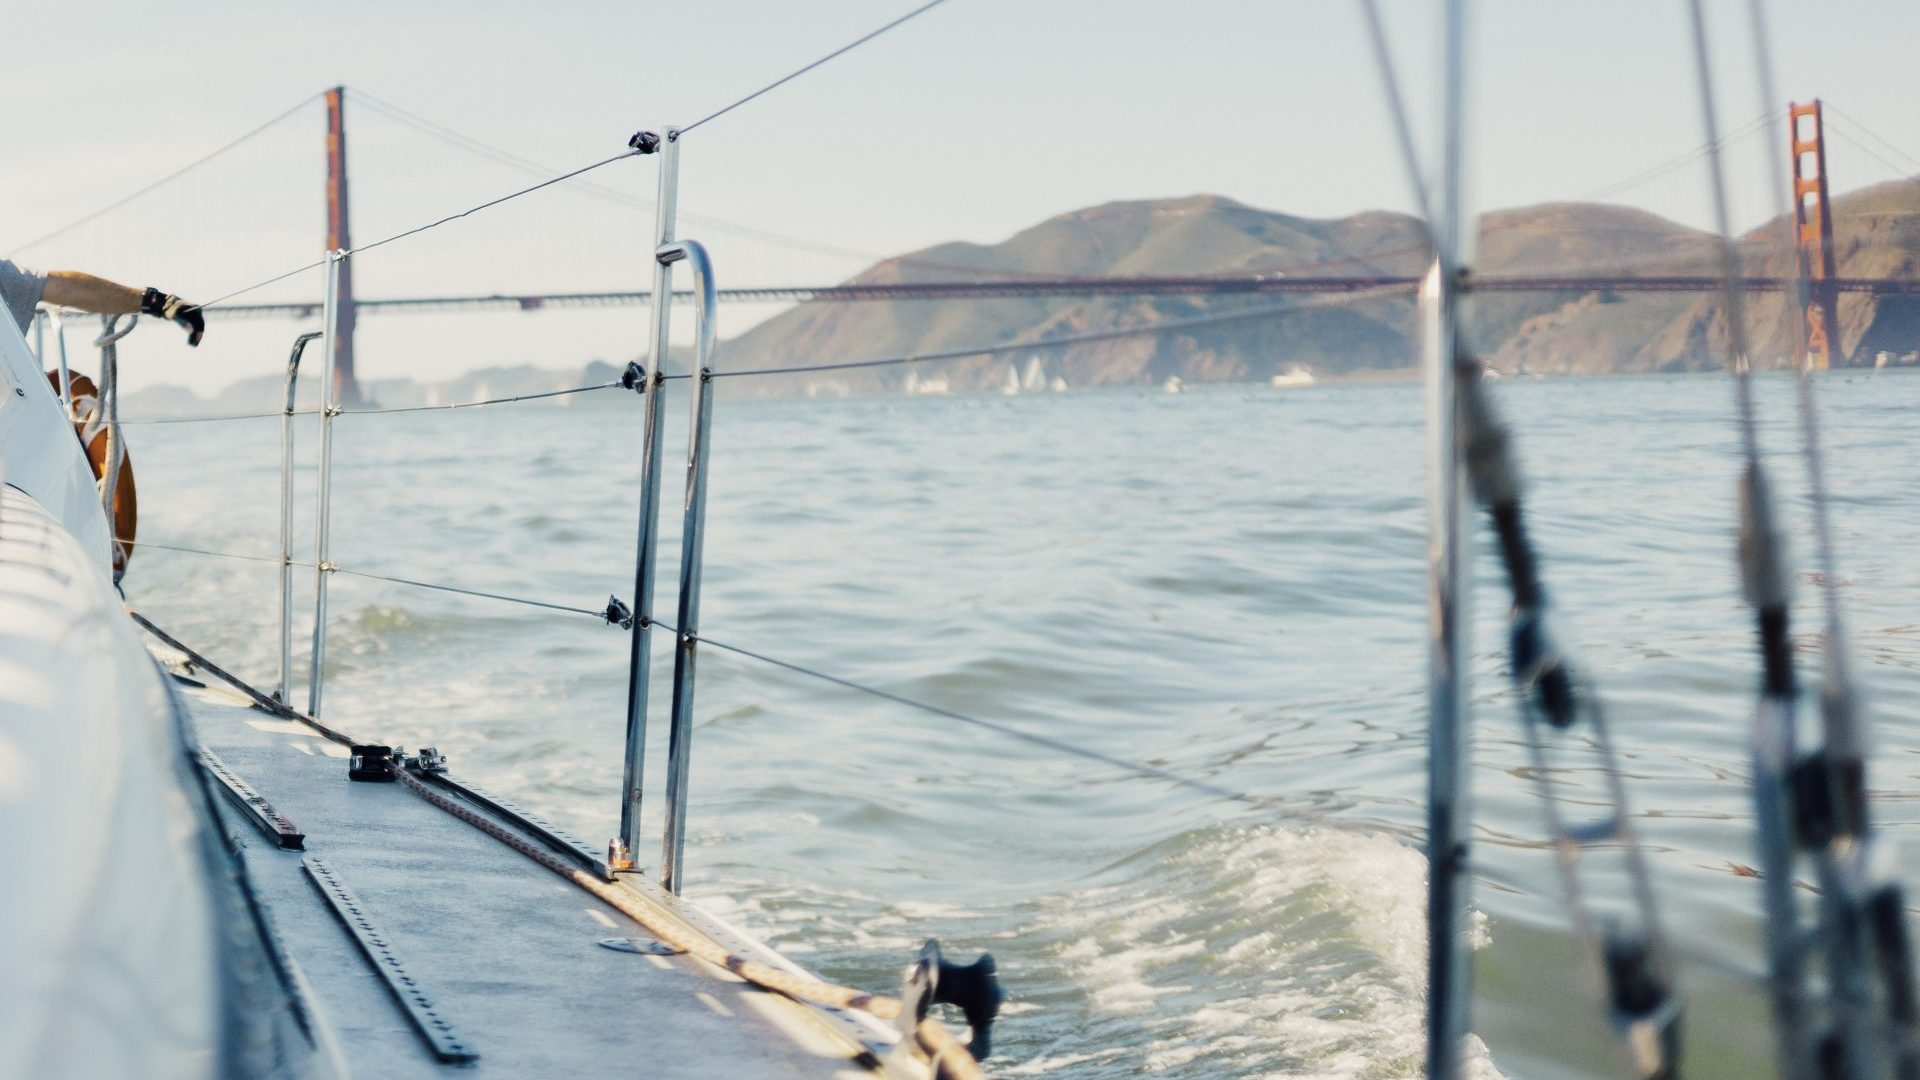 Whitbread Round the World Yacht Race, Team Dennis Conner